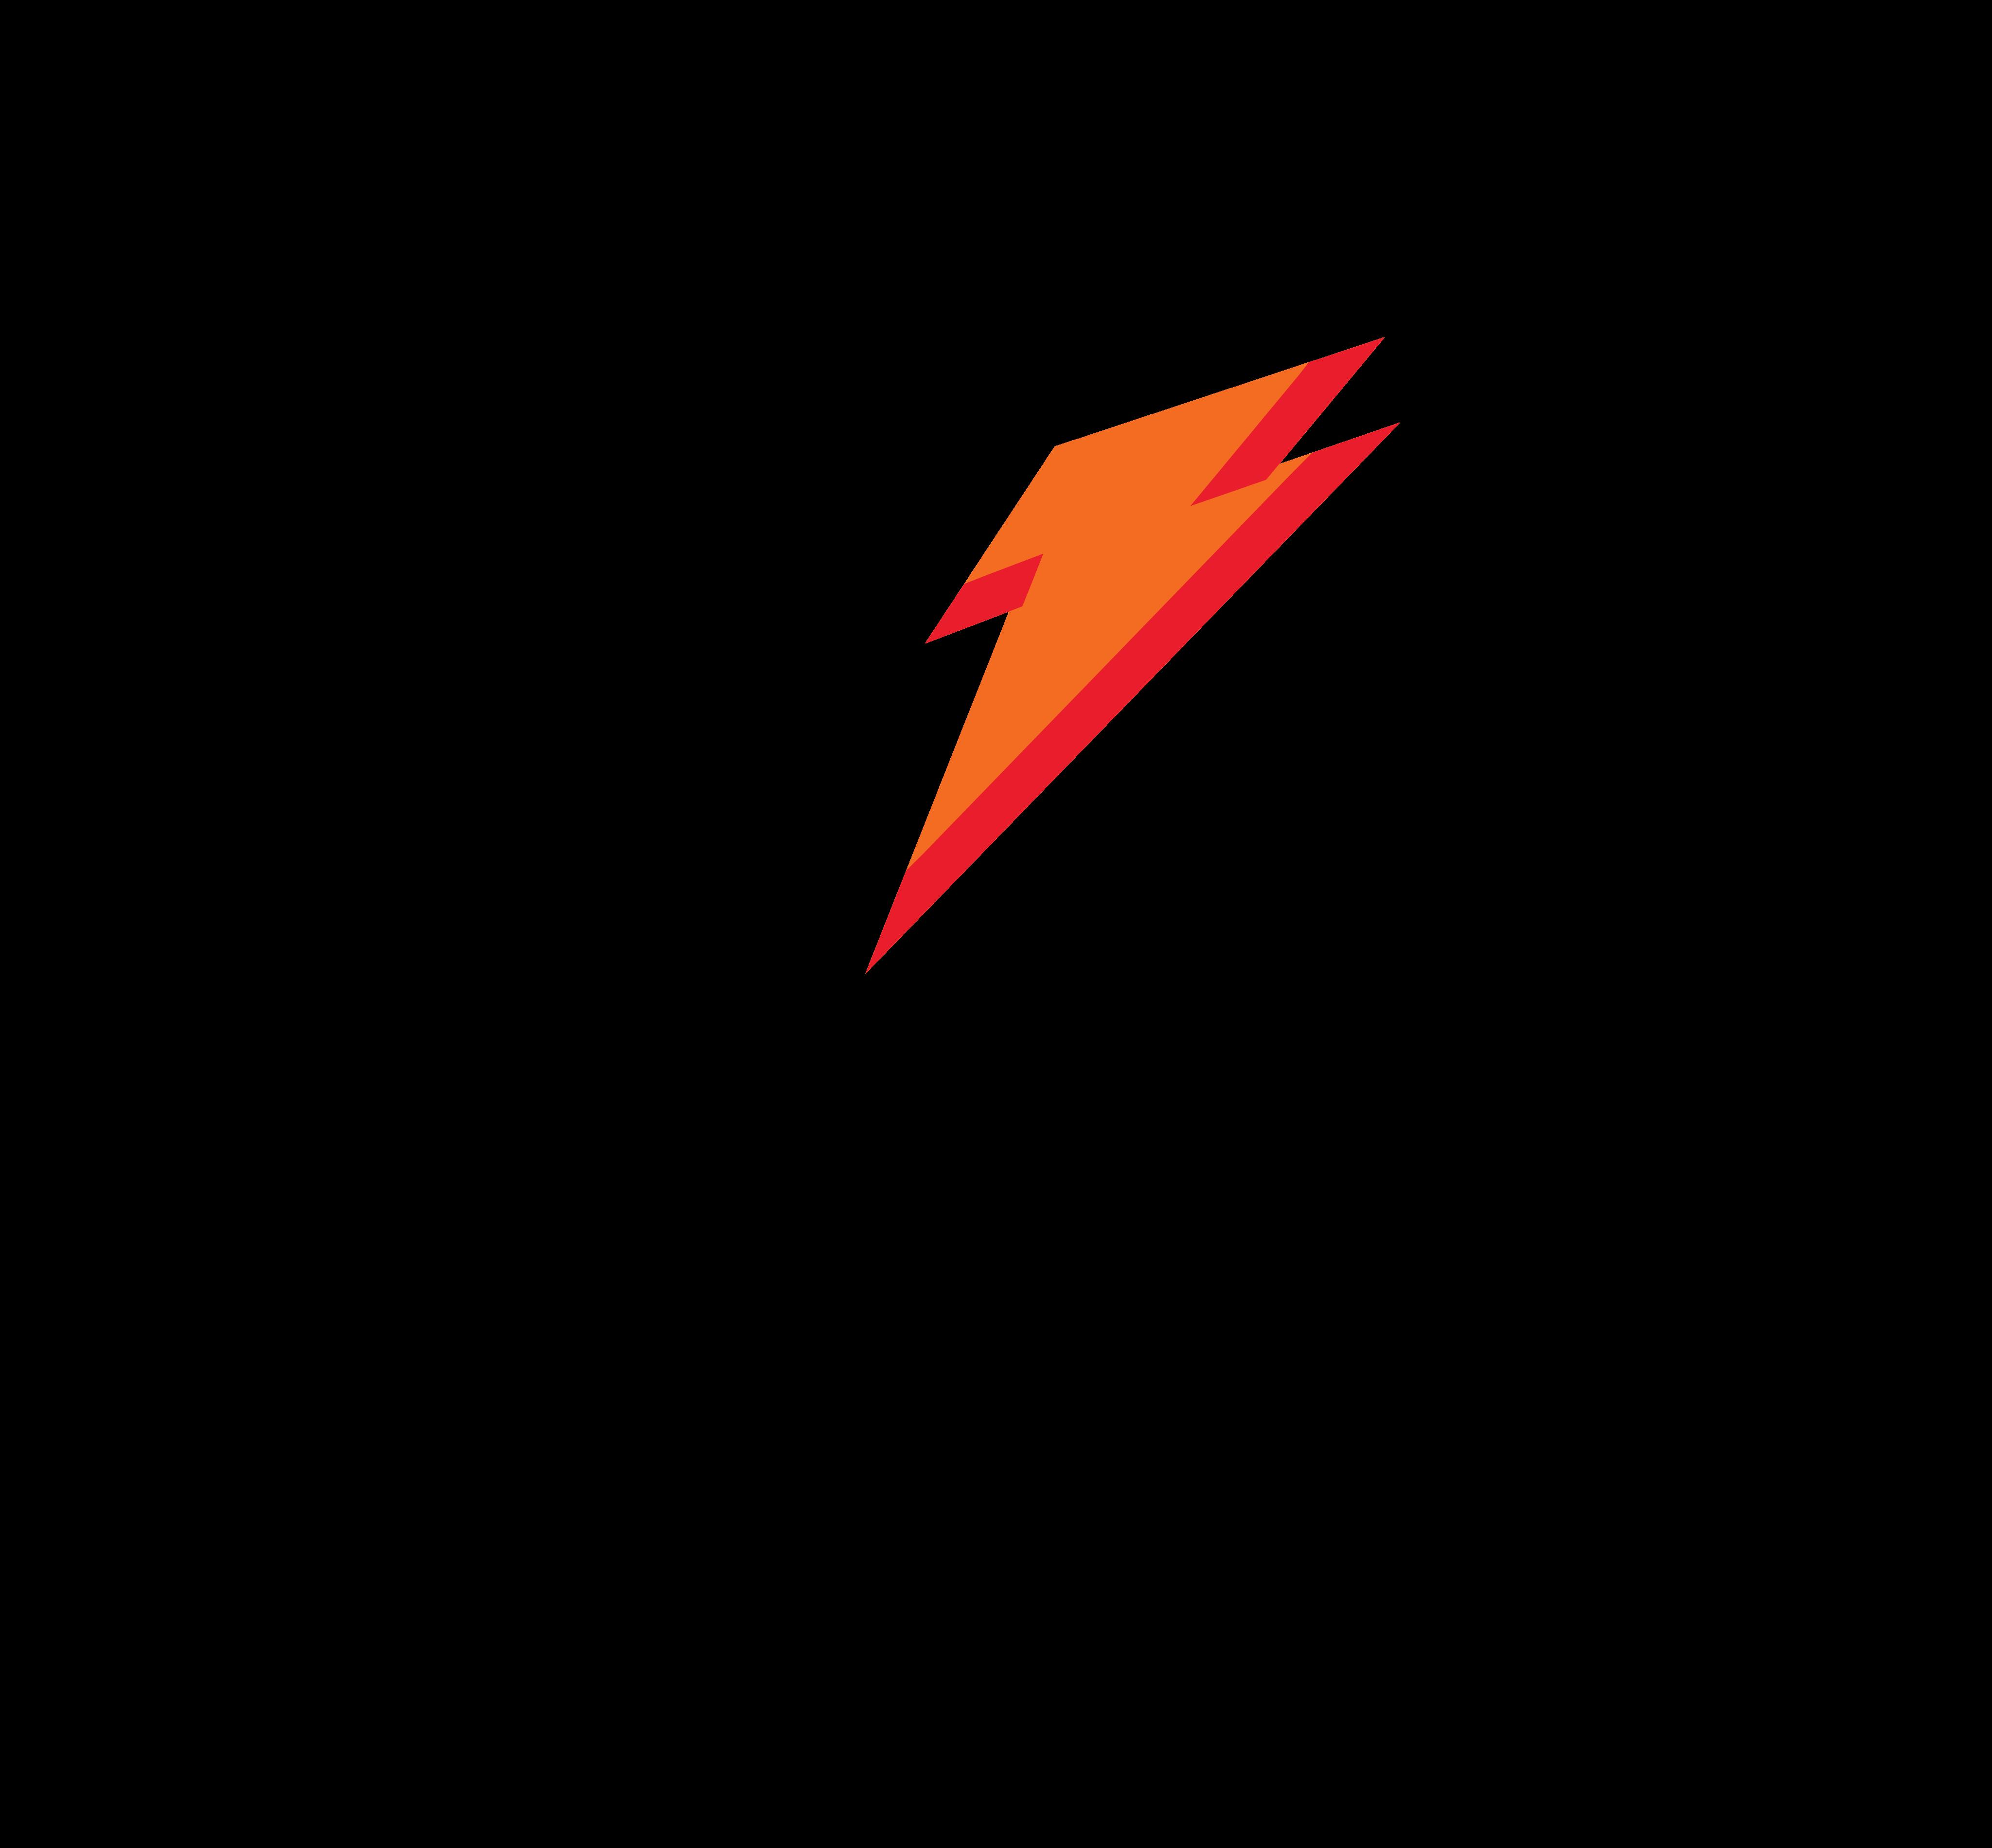 gatorade logo 1 - Gatorade Logo